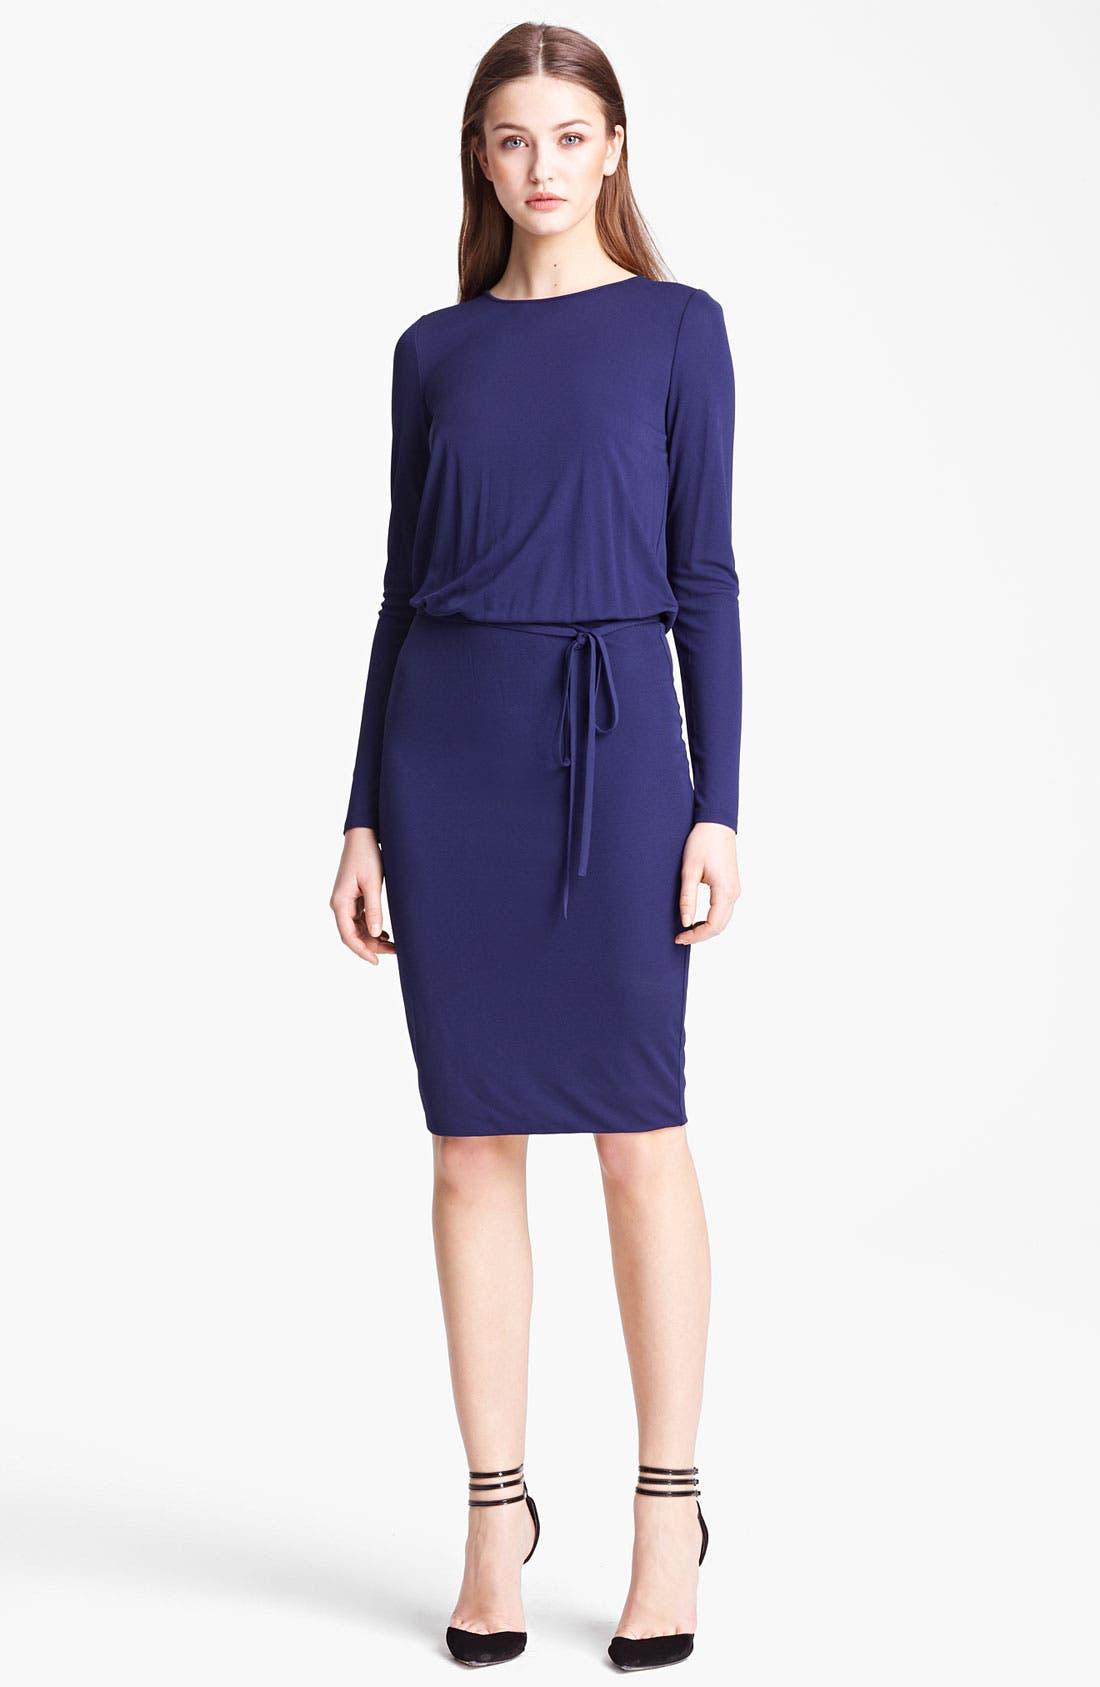 Main Image - Emilio Pucci Embellished Jersey Dress